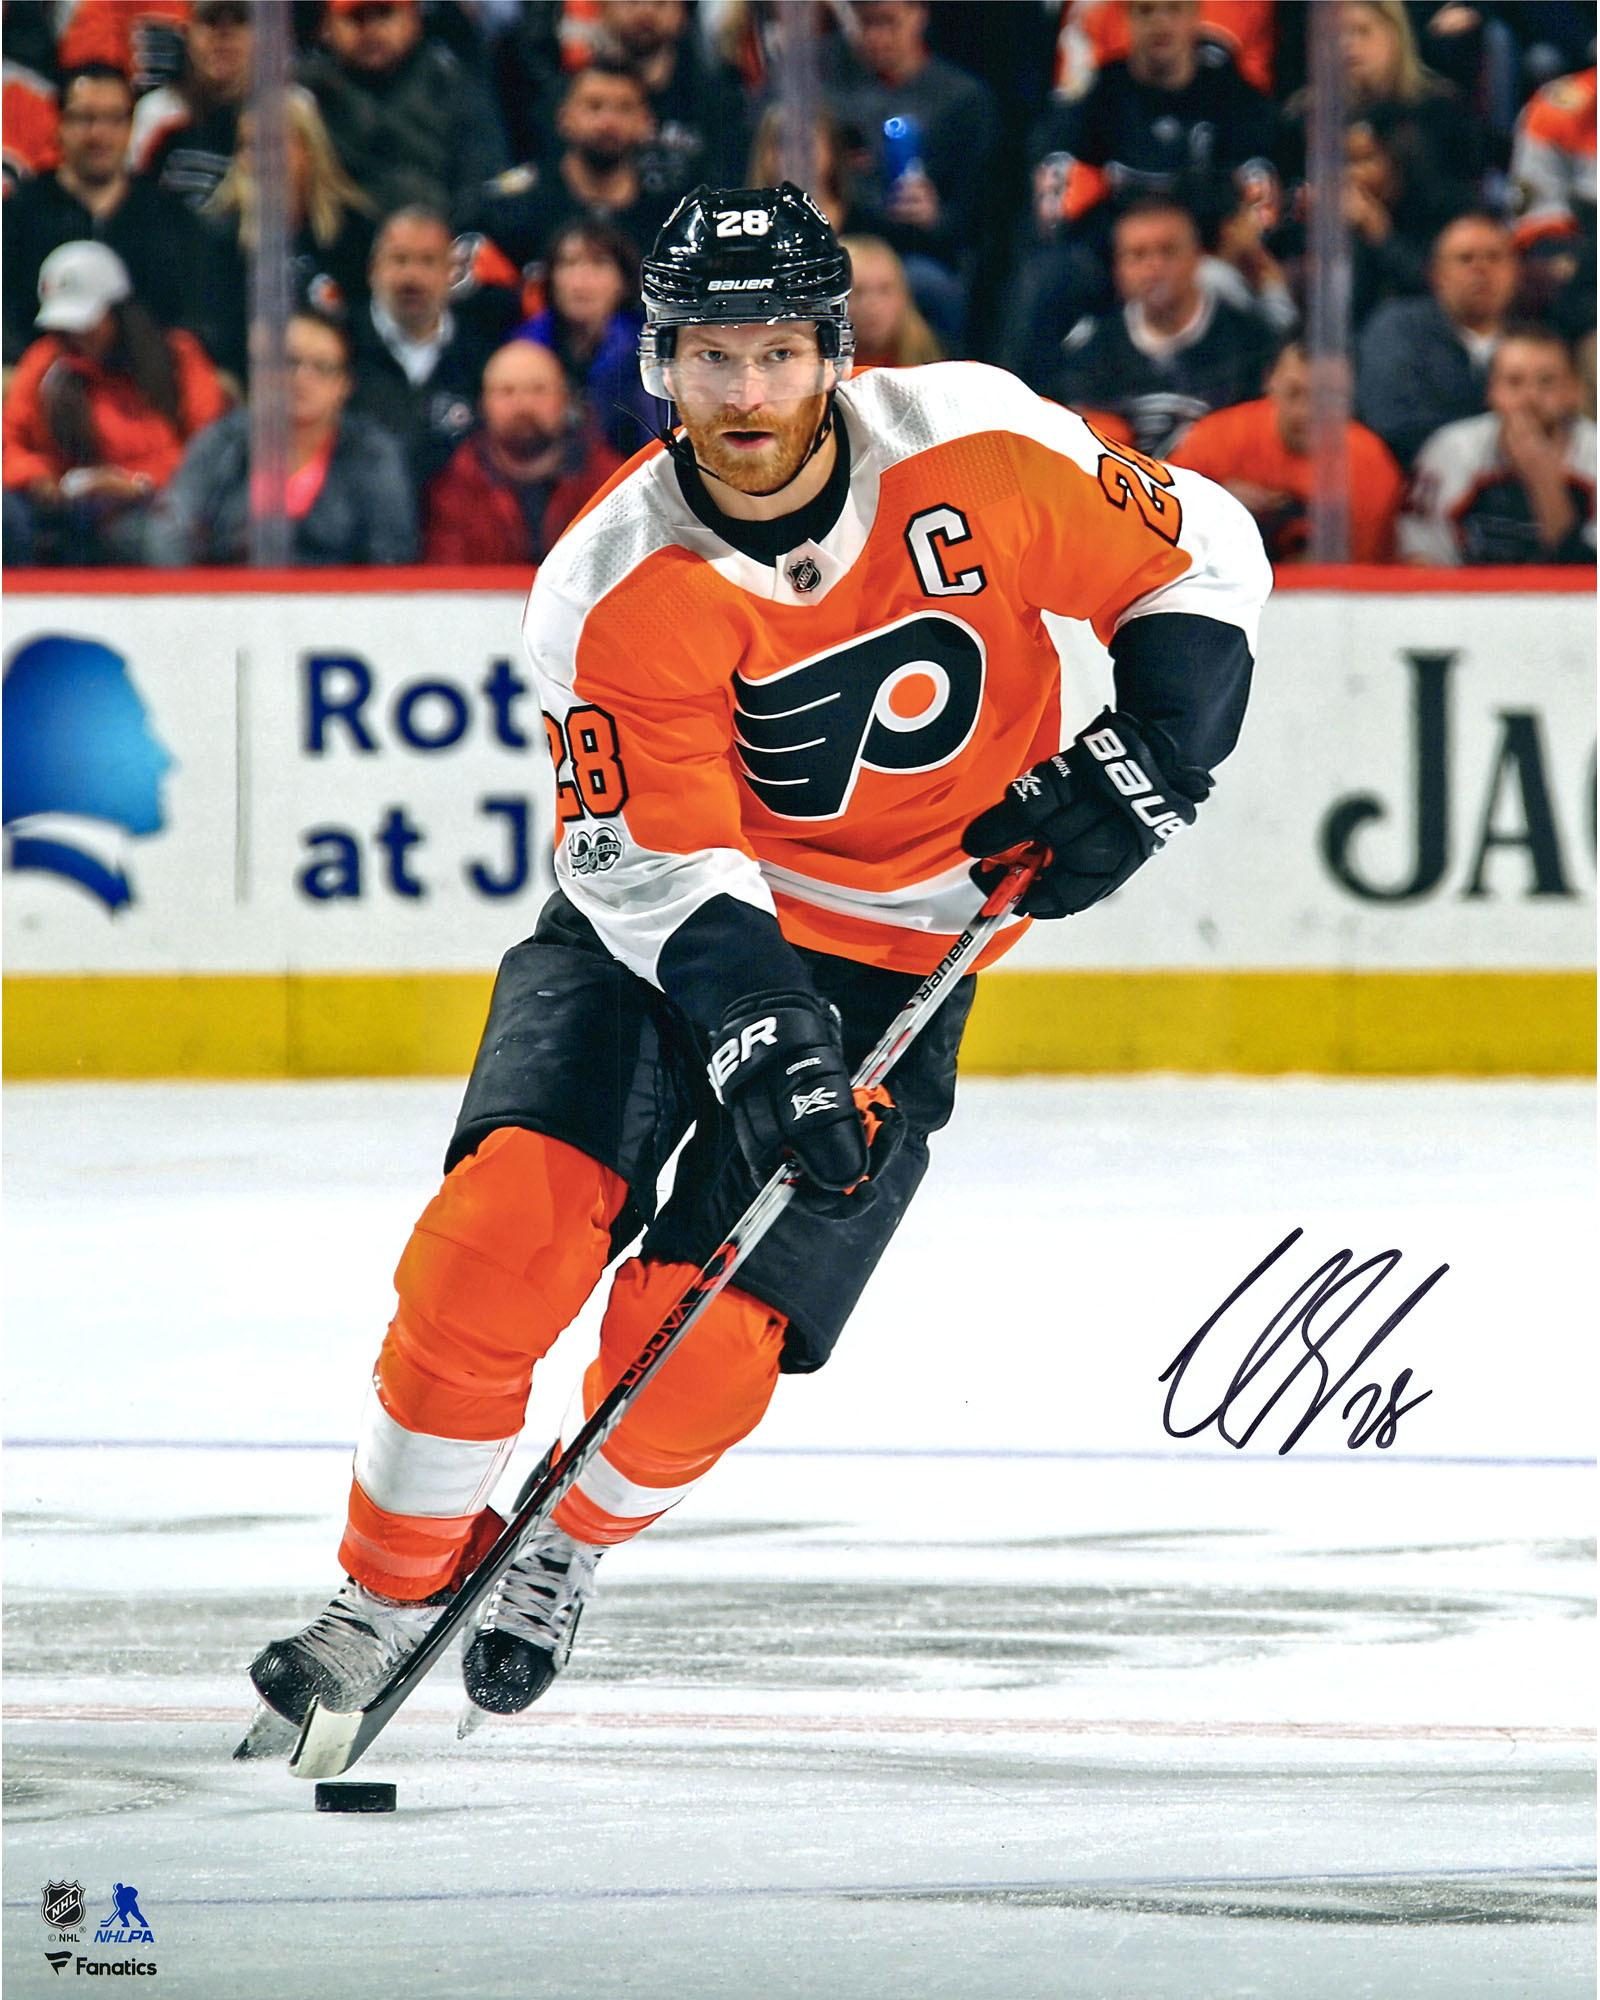 "Claude Giroux Philadelphia Flyers Autographed 16"" x 20"" Vertical Skating Photograph Fanatics Authentic... by Fanatics Authentic"